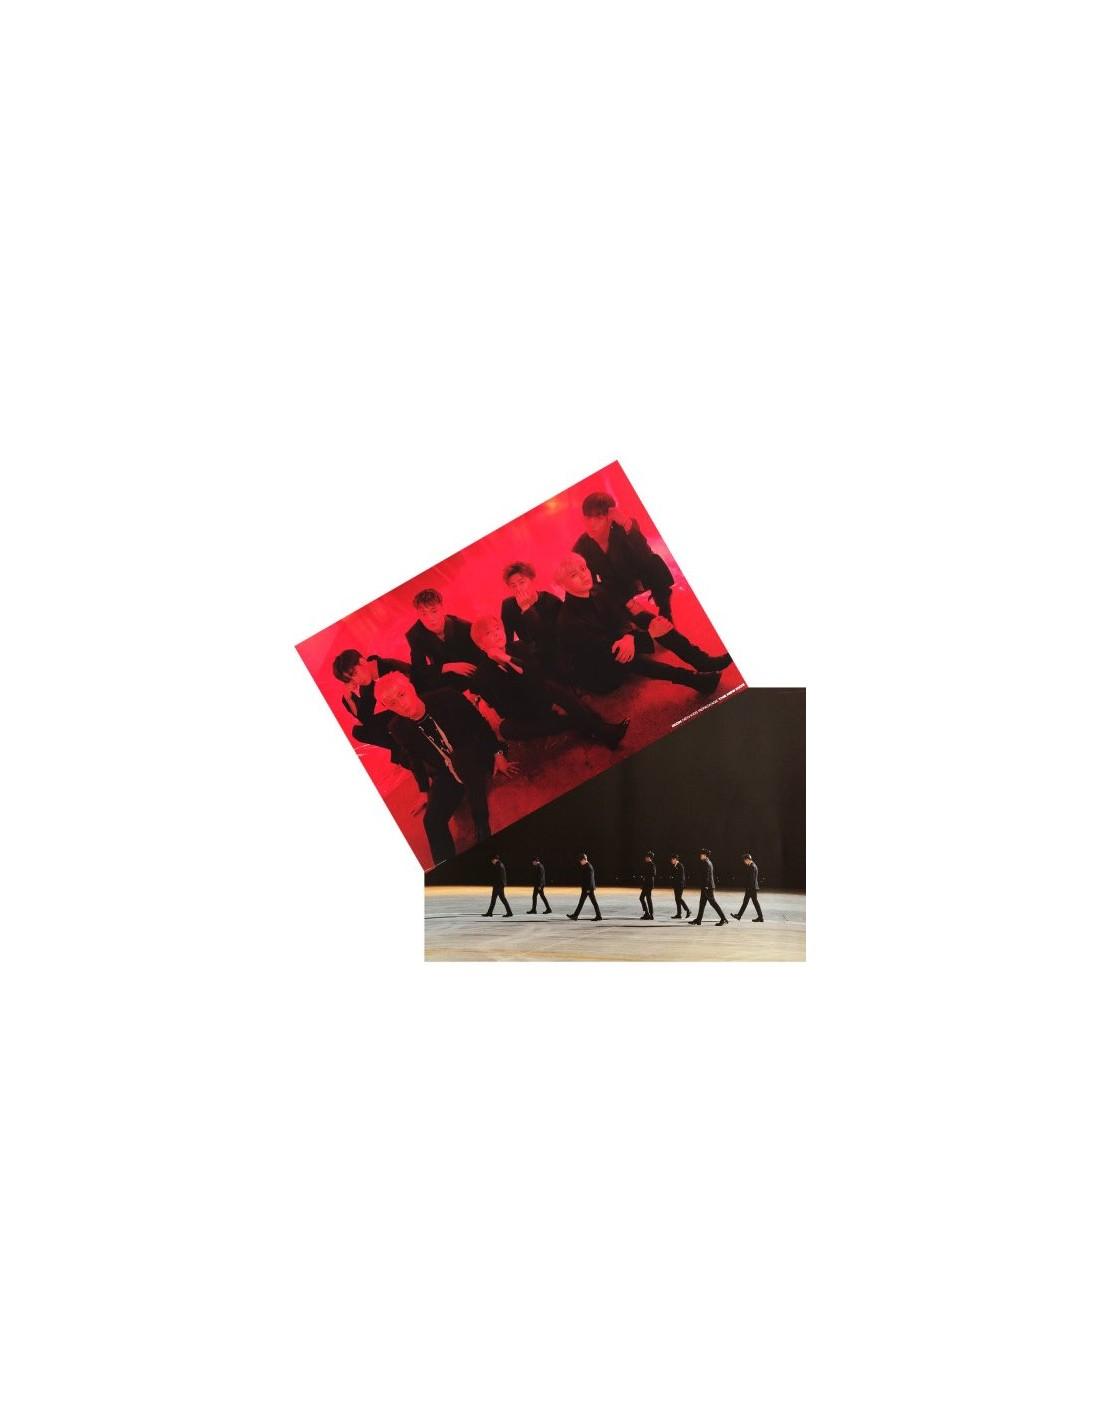 [Poster] iKON New Kids Repackage Album - The New Kids Poster